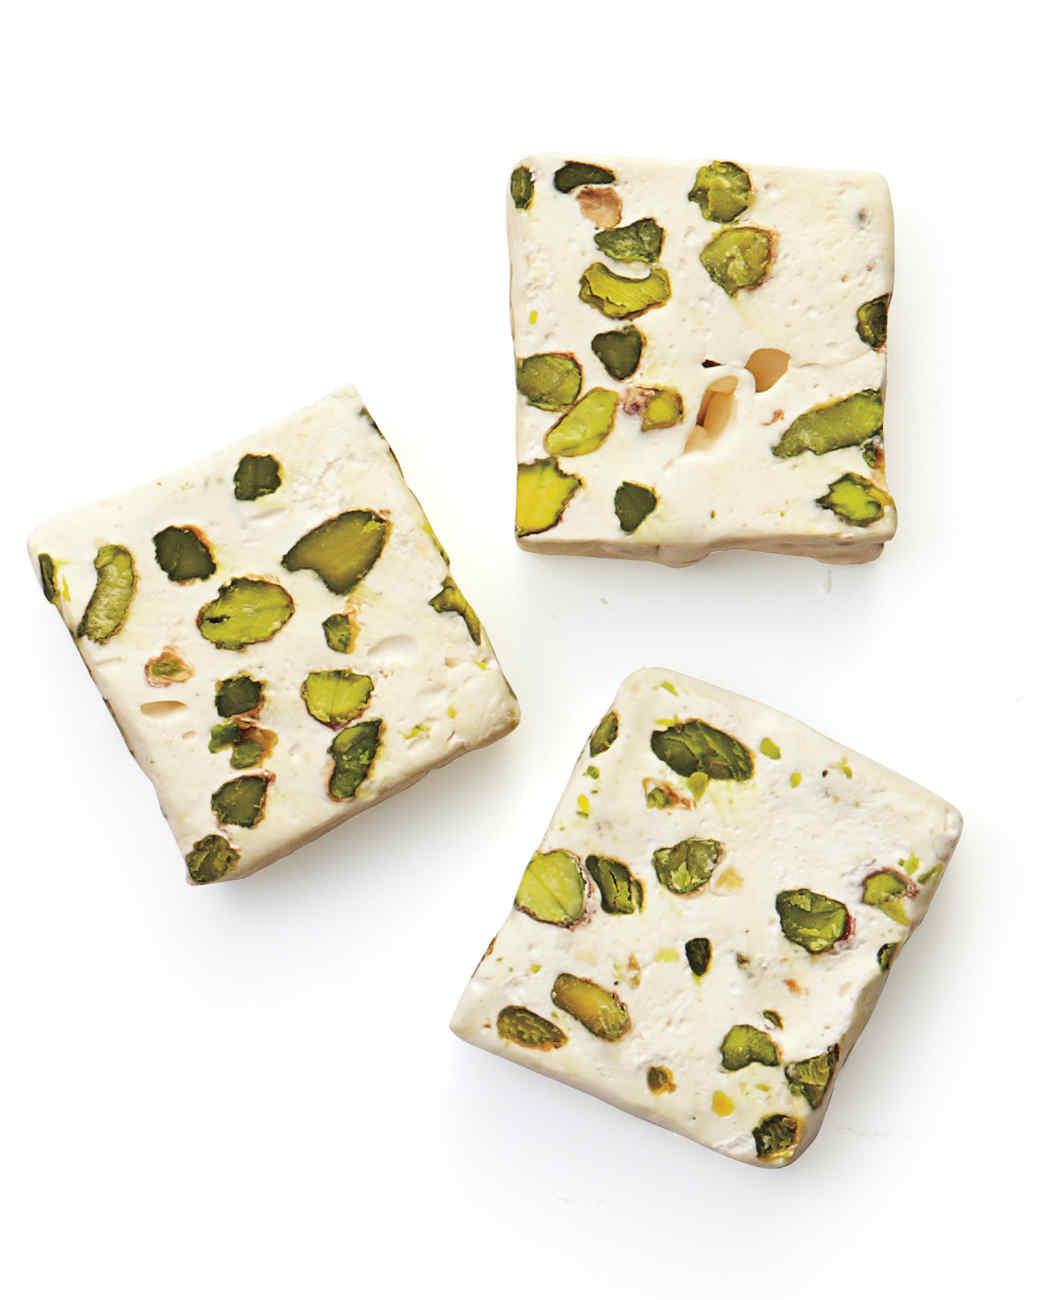 pistachio-024-mld110044.jpg